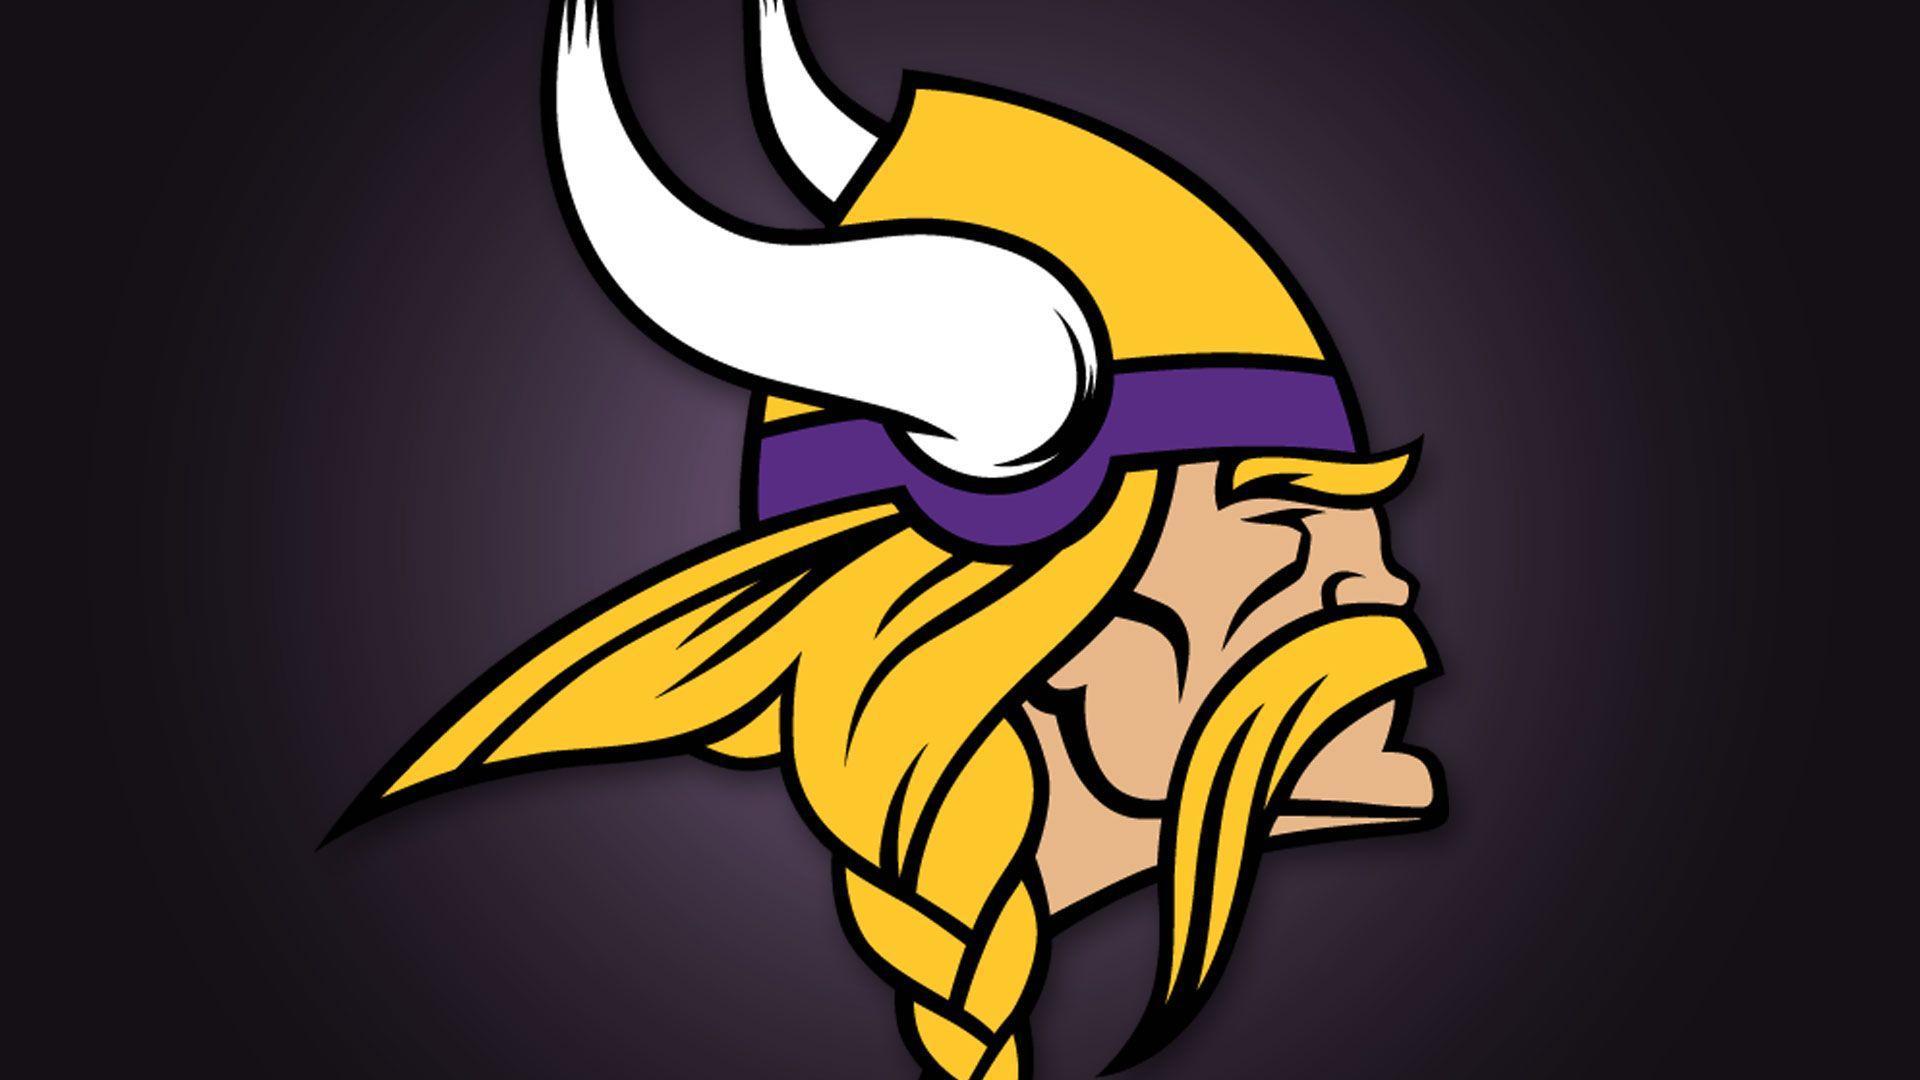 Minnesota Vikings Wallpapers Top Free Minnesota Vikings